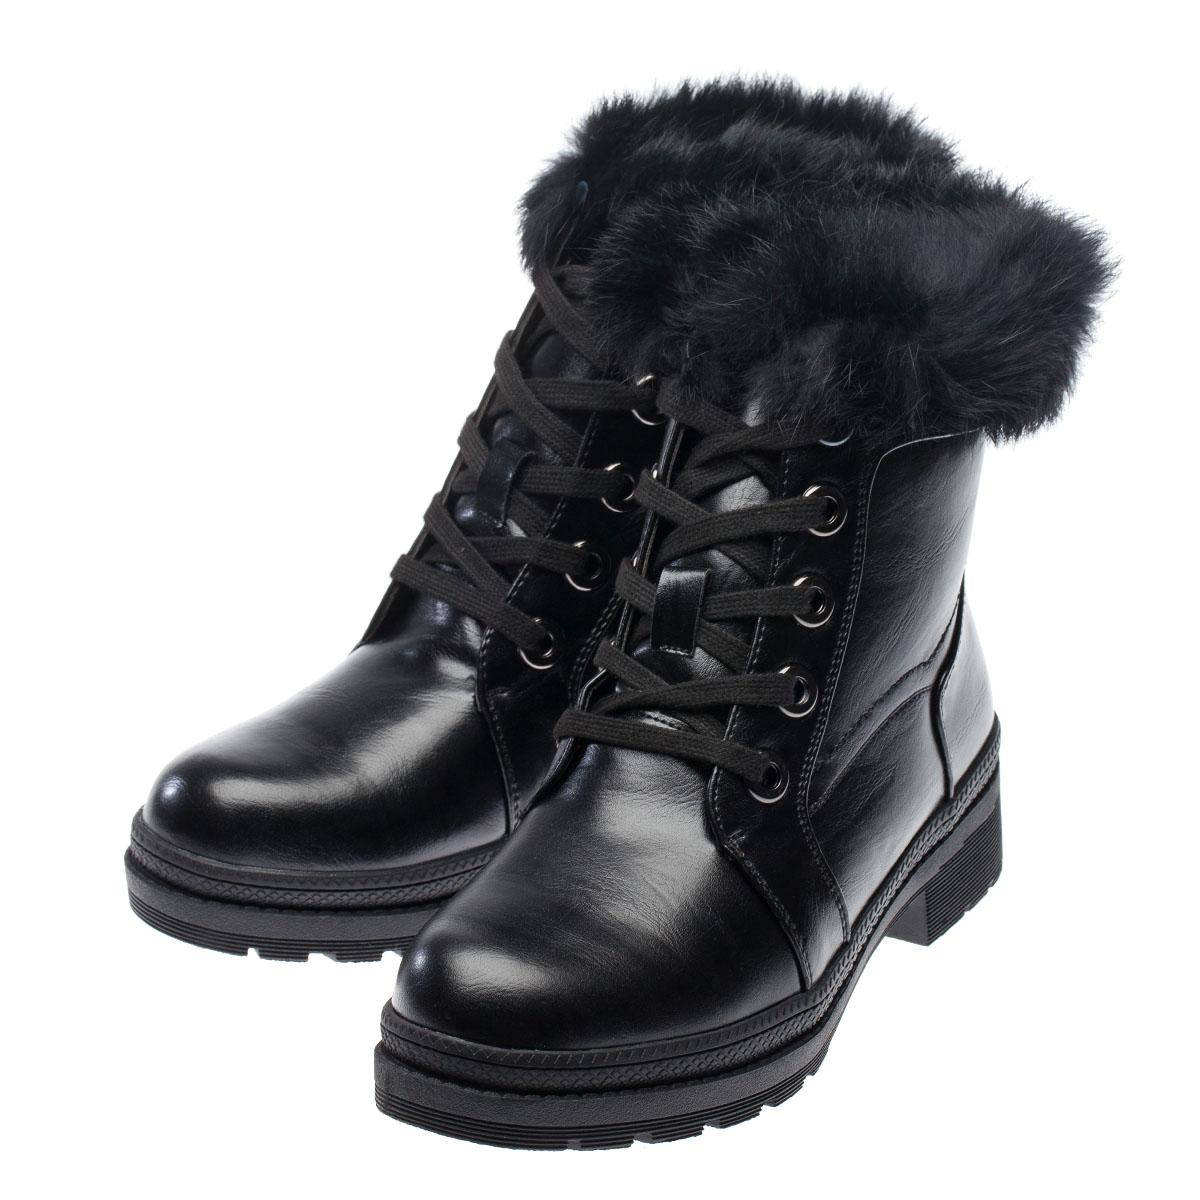 Ботинки зимние FERTO, F15-28615